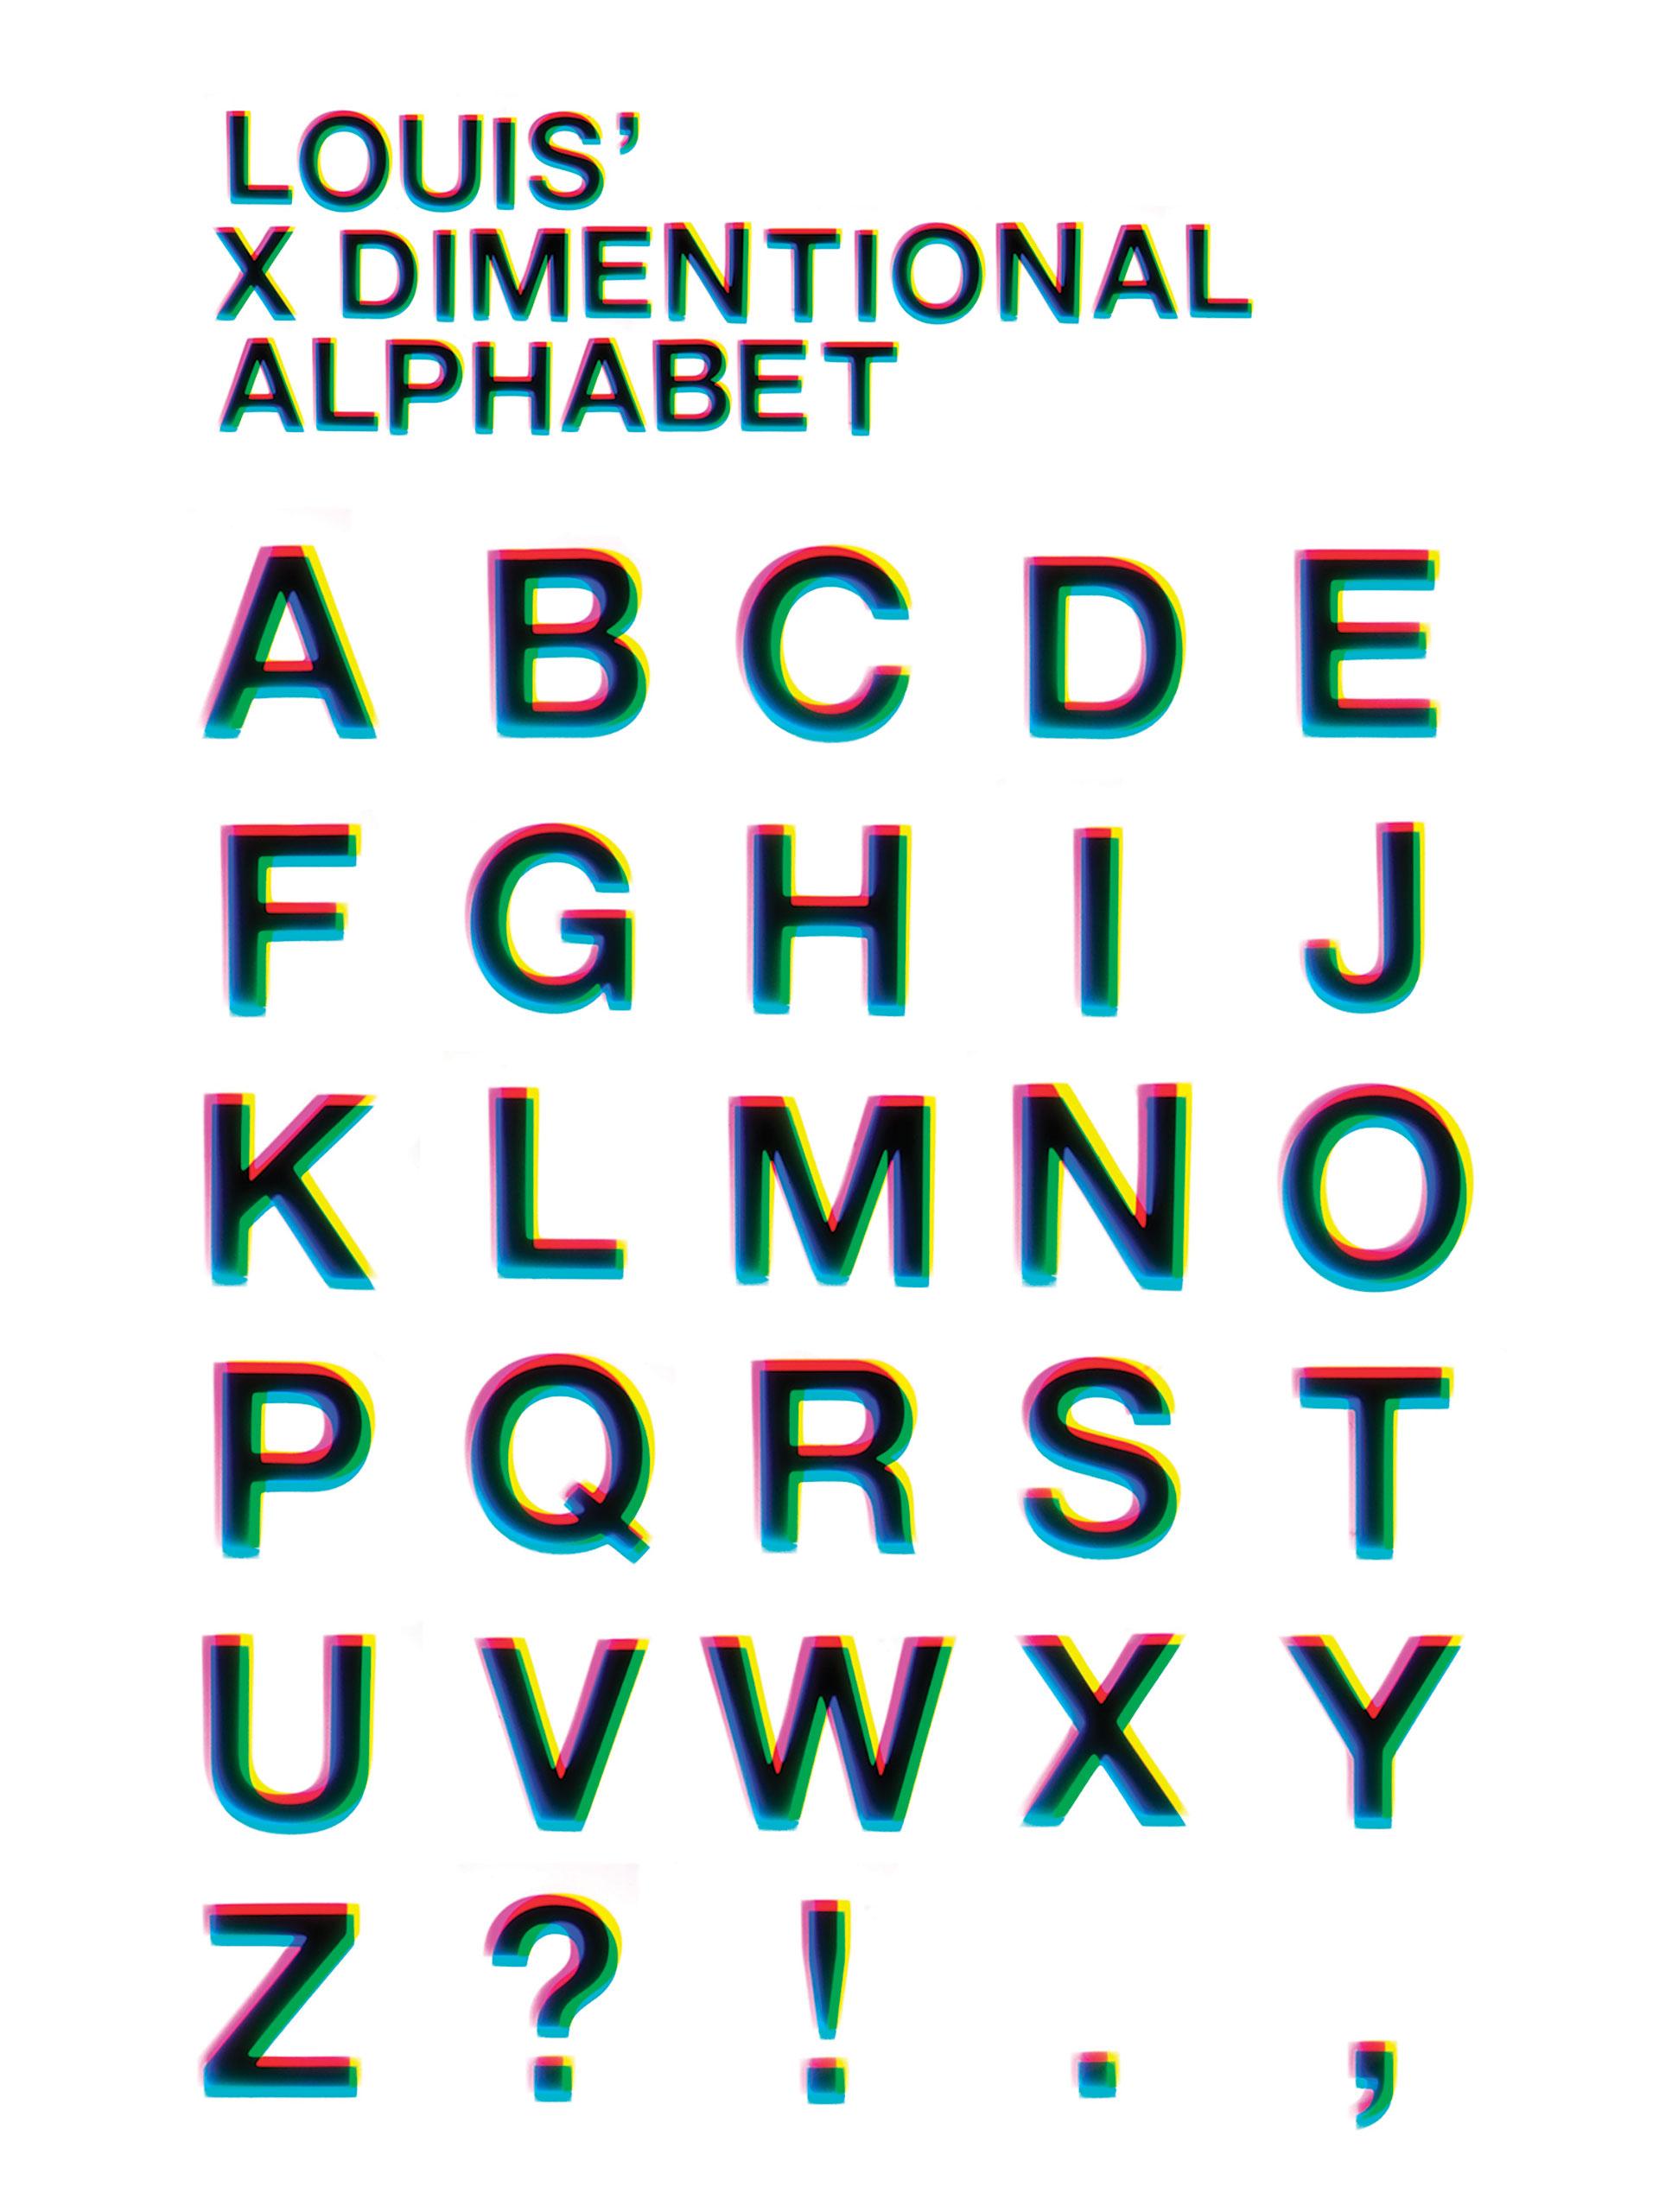 Elwood-Leach_Louis_Typography.jpg